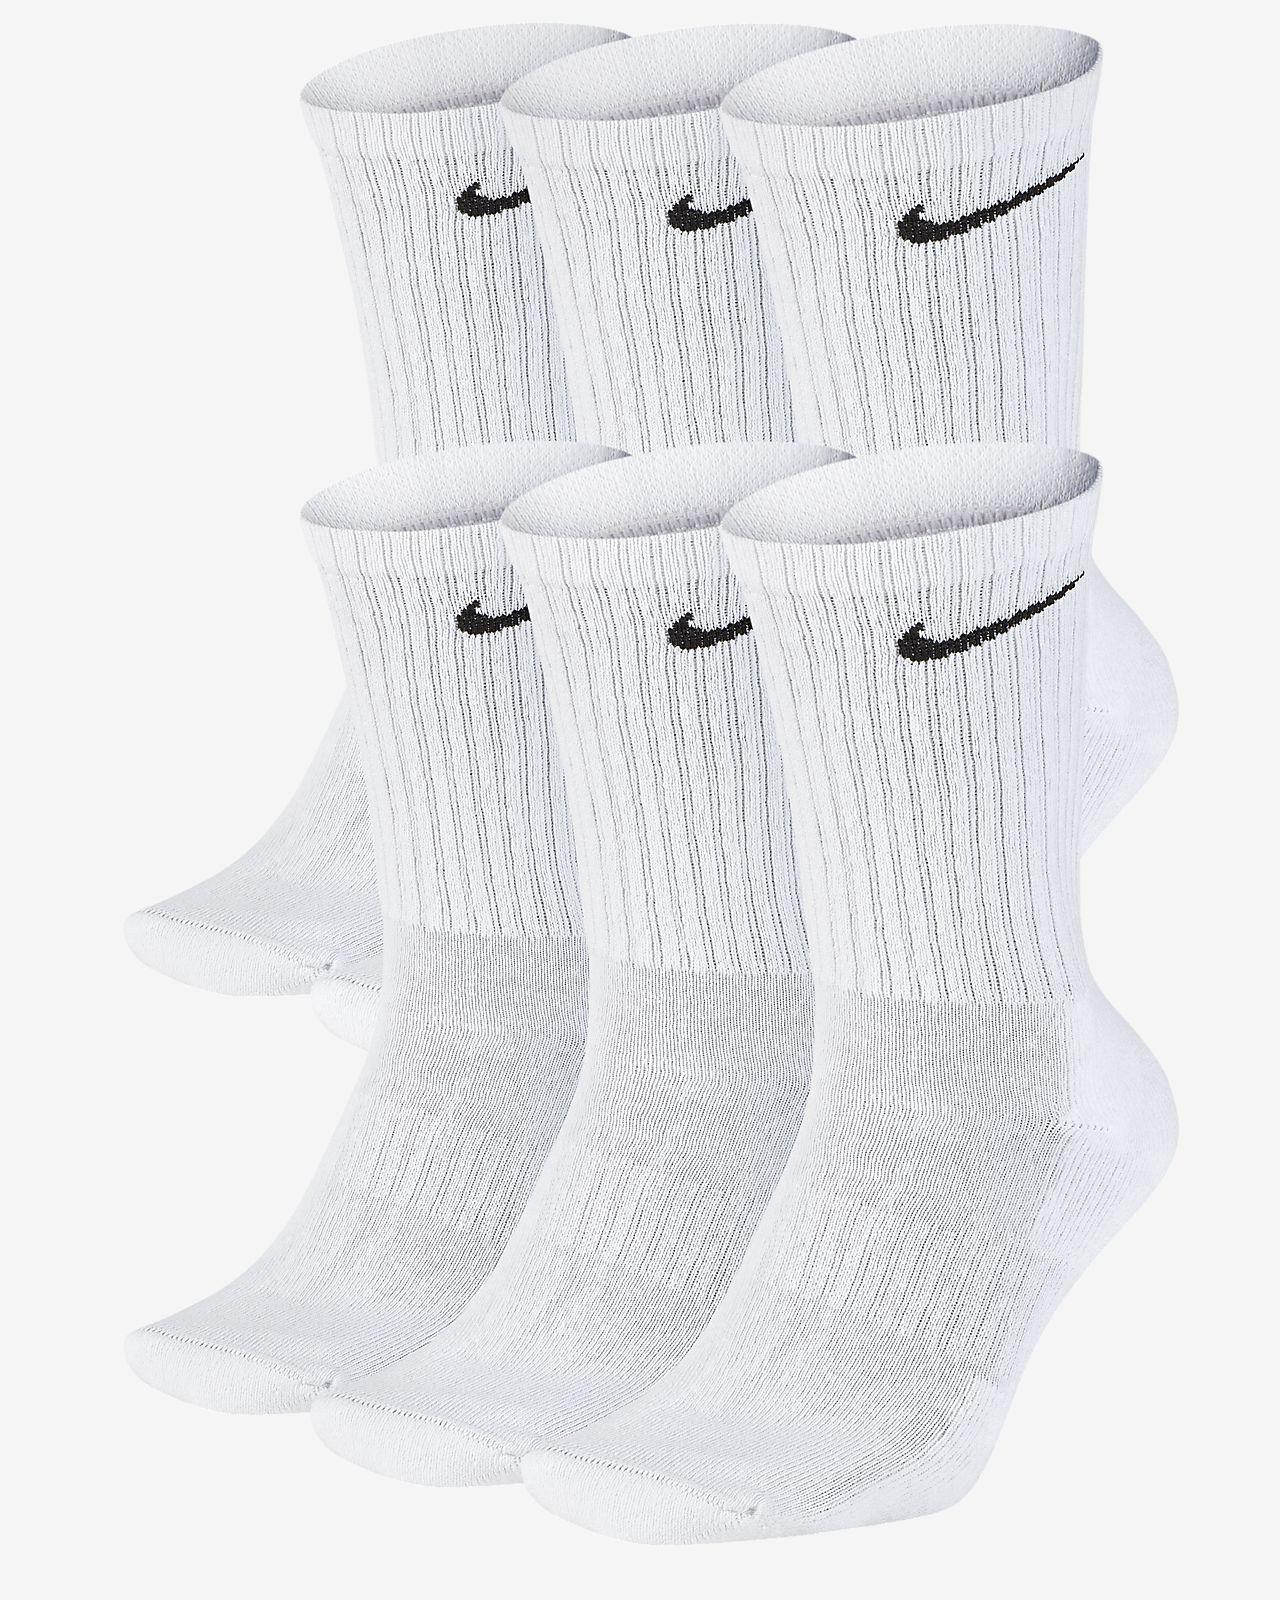 Nike Everyday Cushion Crew Training Socks (6 Pair)